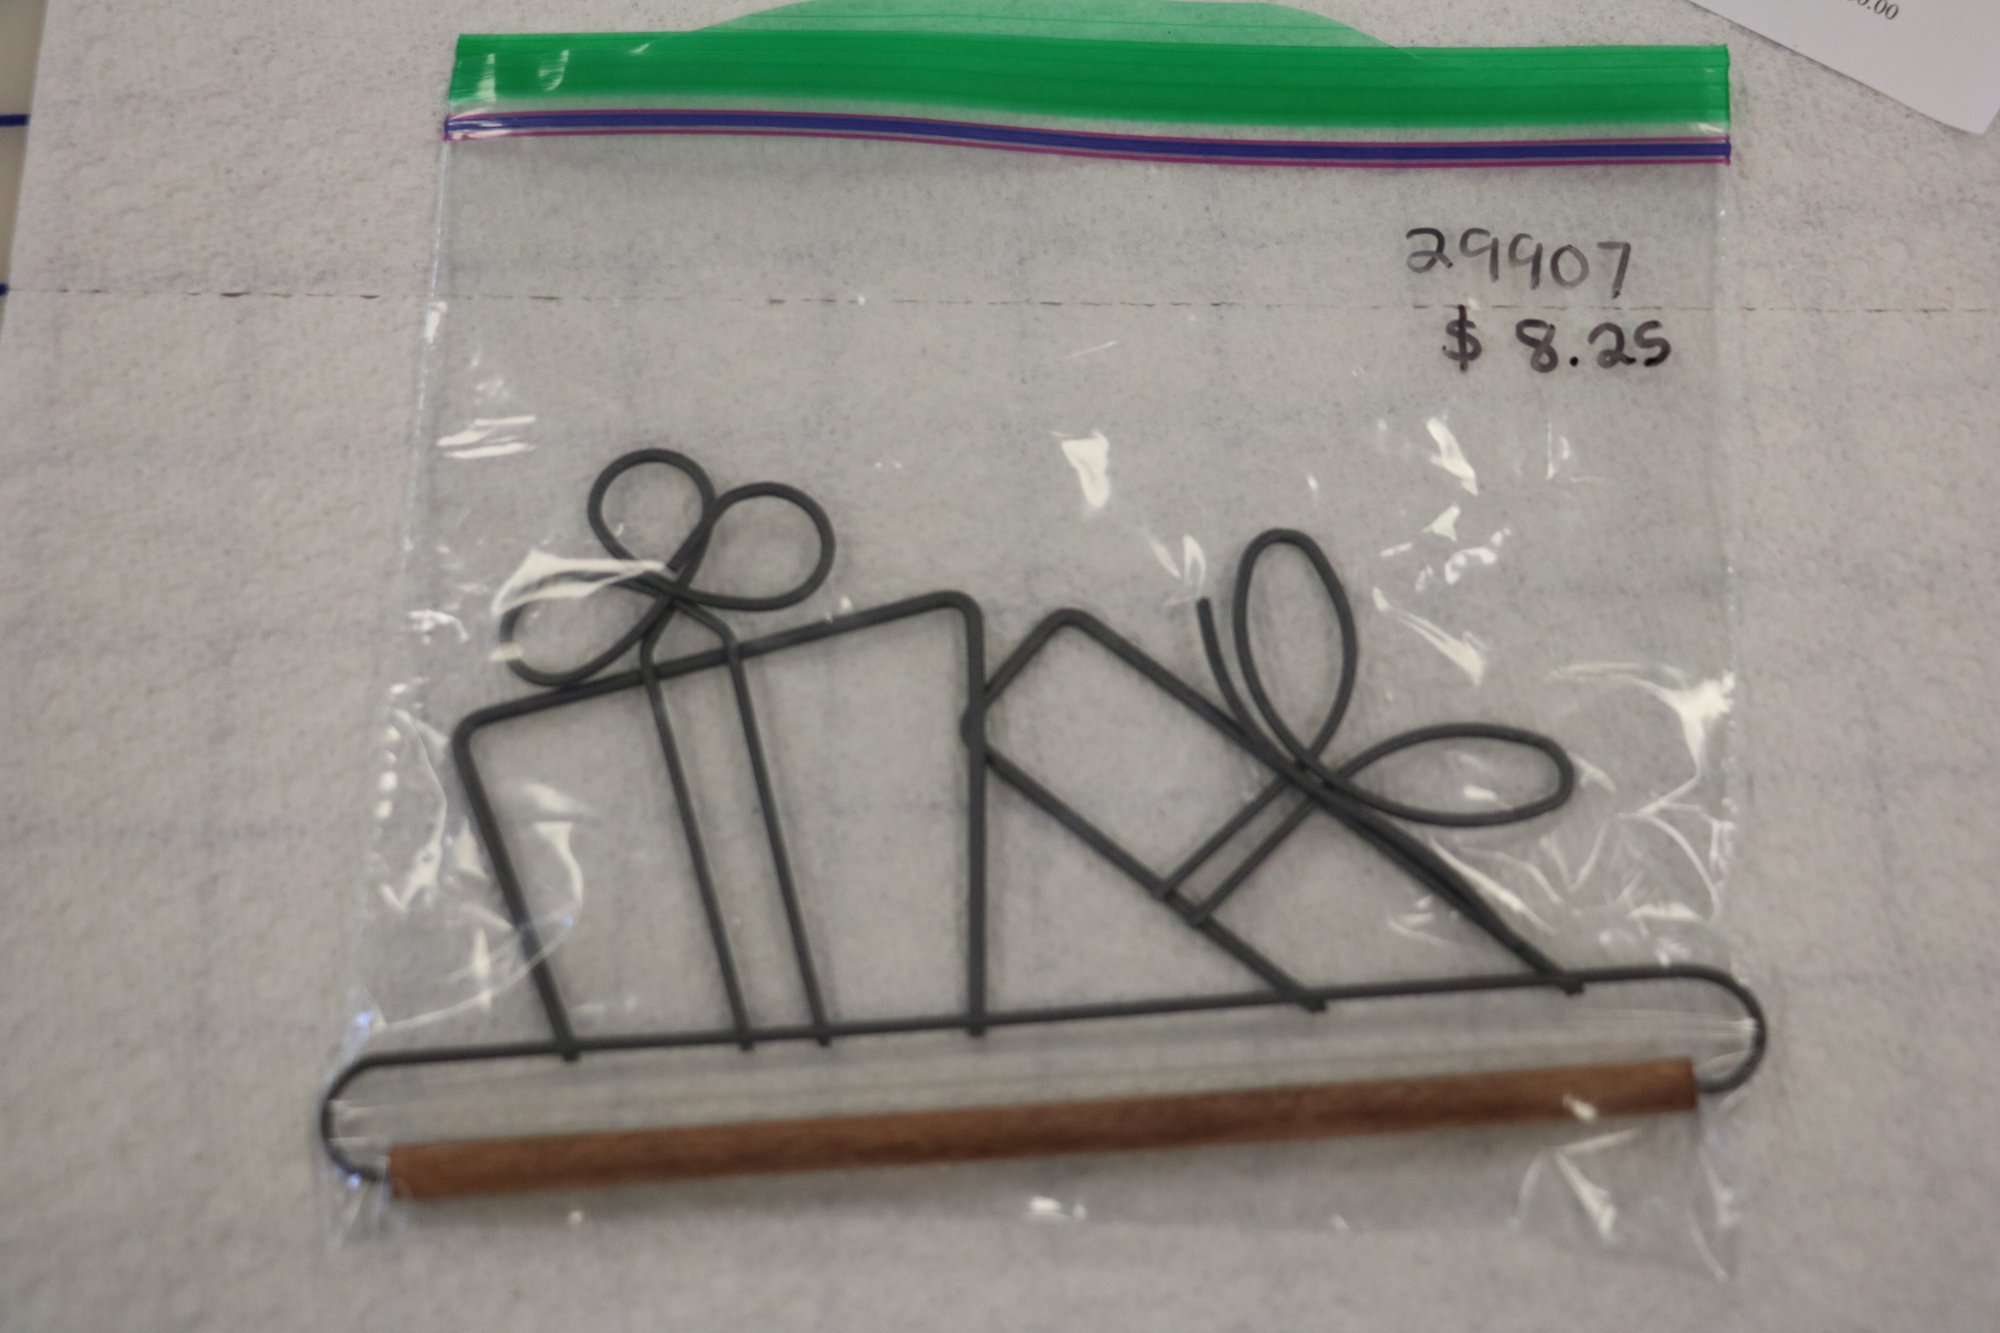 29907 package hanger